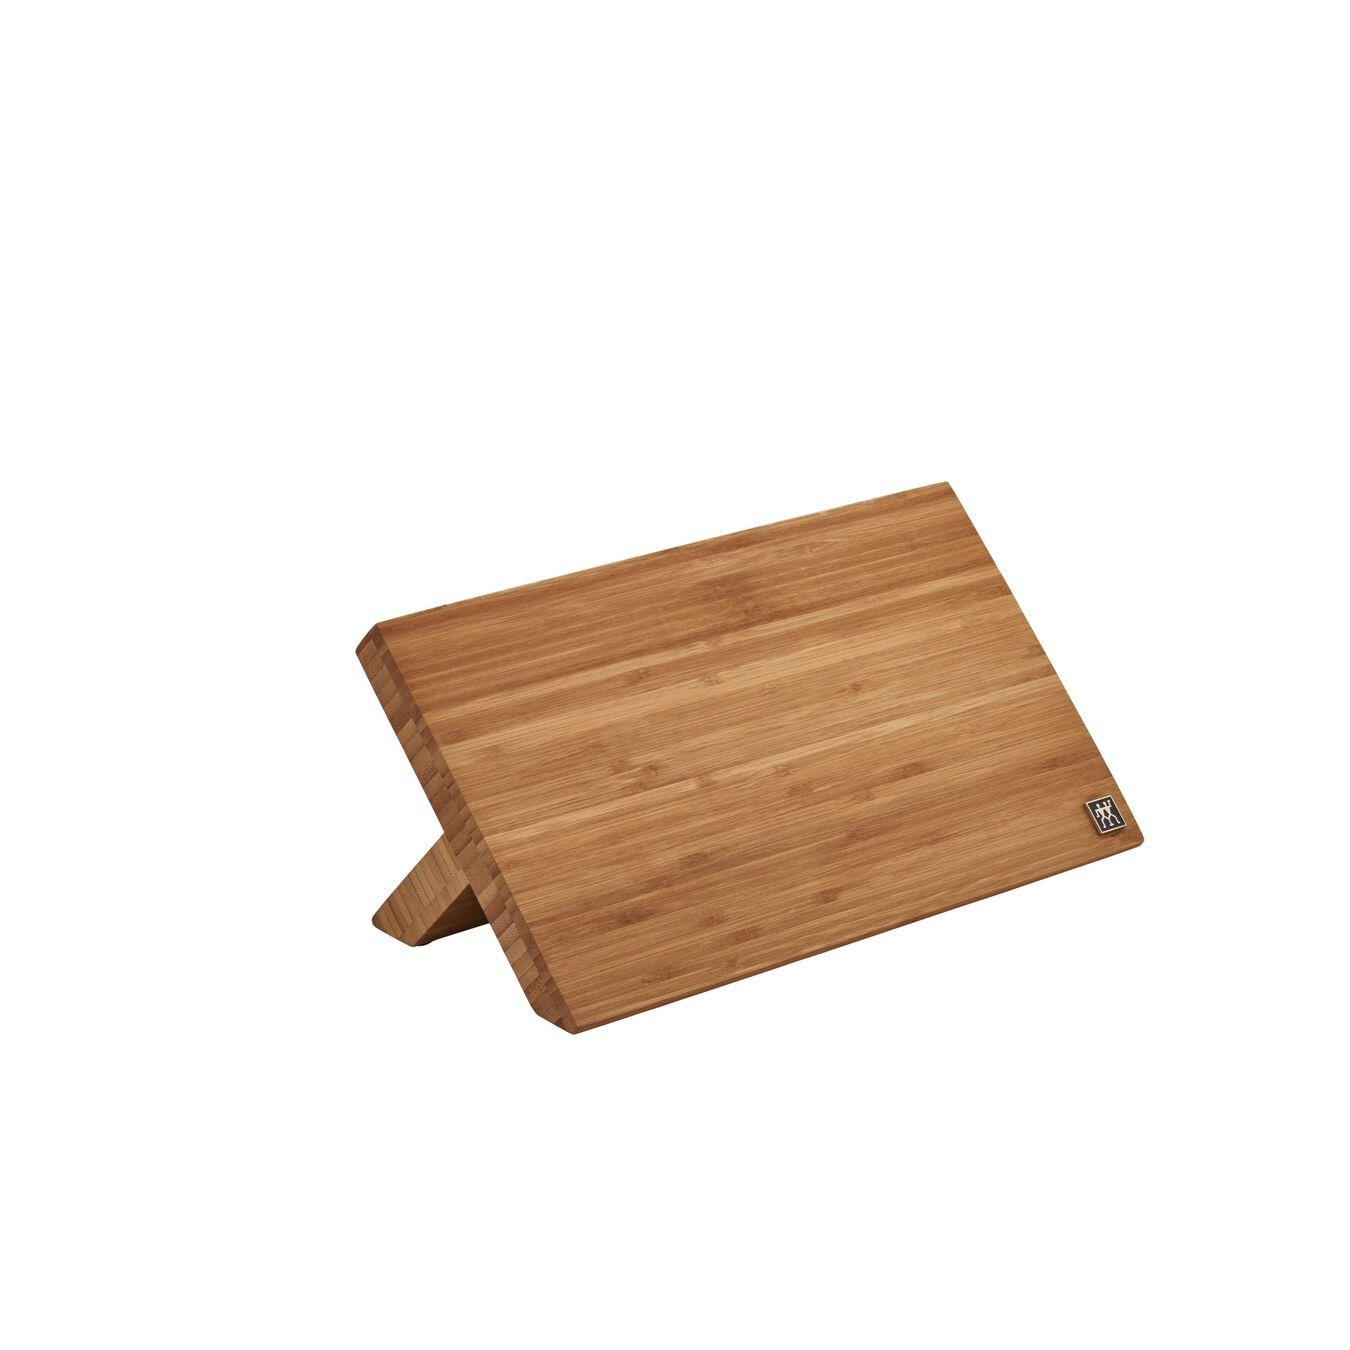 Bamboo, Knife block empty,,large 4